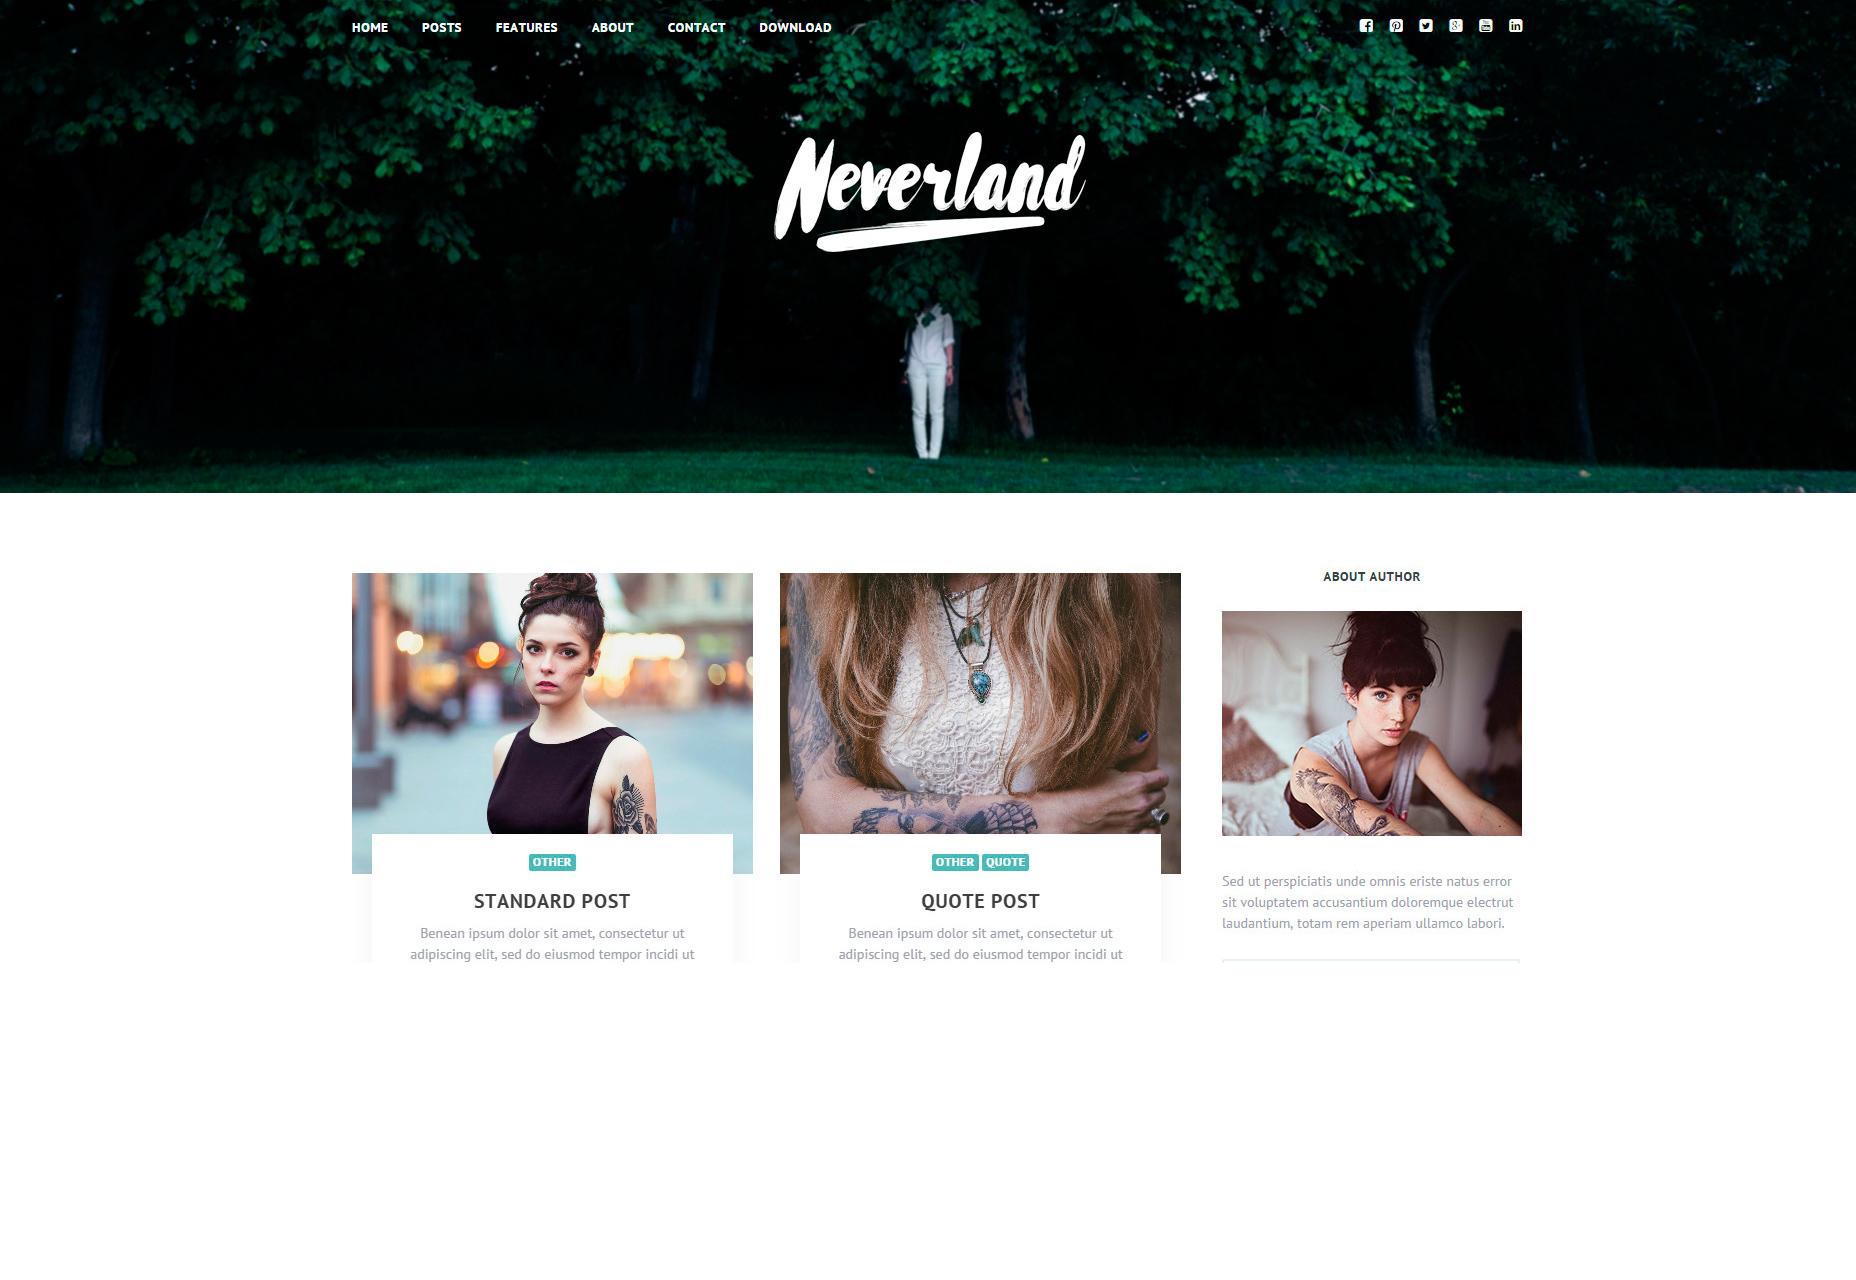 Neverland: Free Personal Blog WordPress Theme